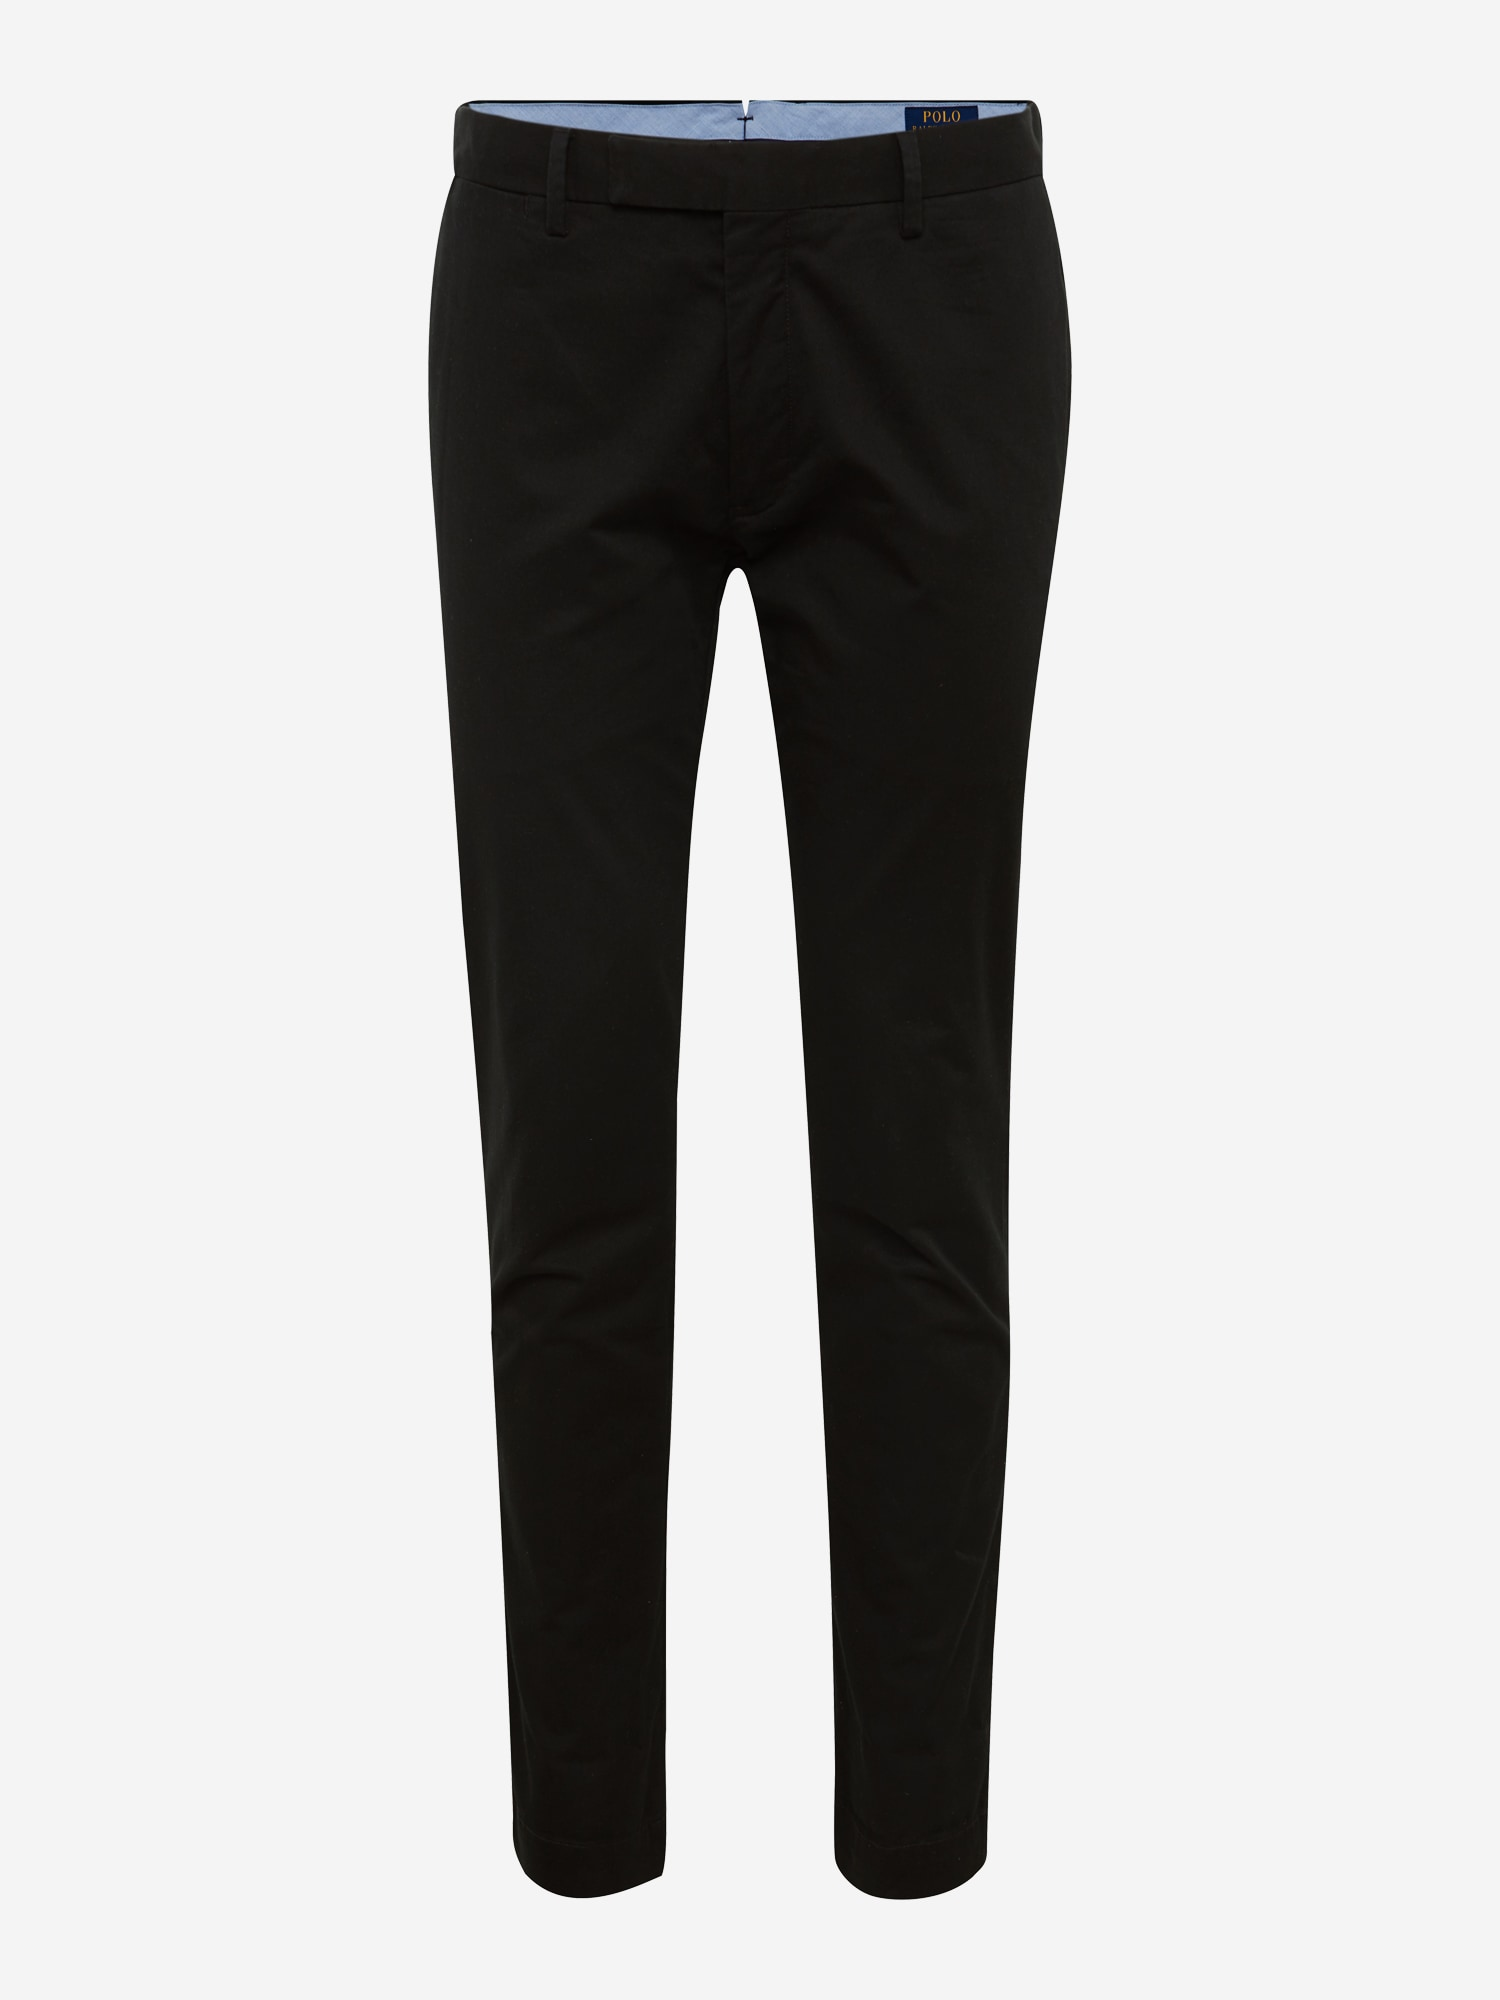 Chino kalhoty SLFHDNP-FLAT-PANT černá POLO RALPH LAUREN